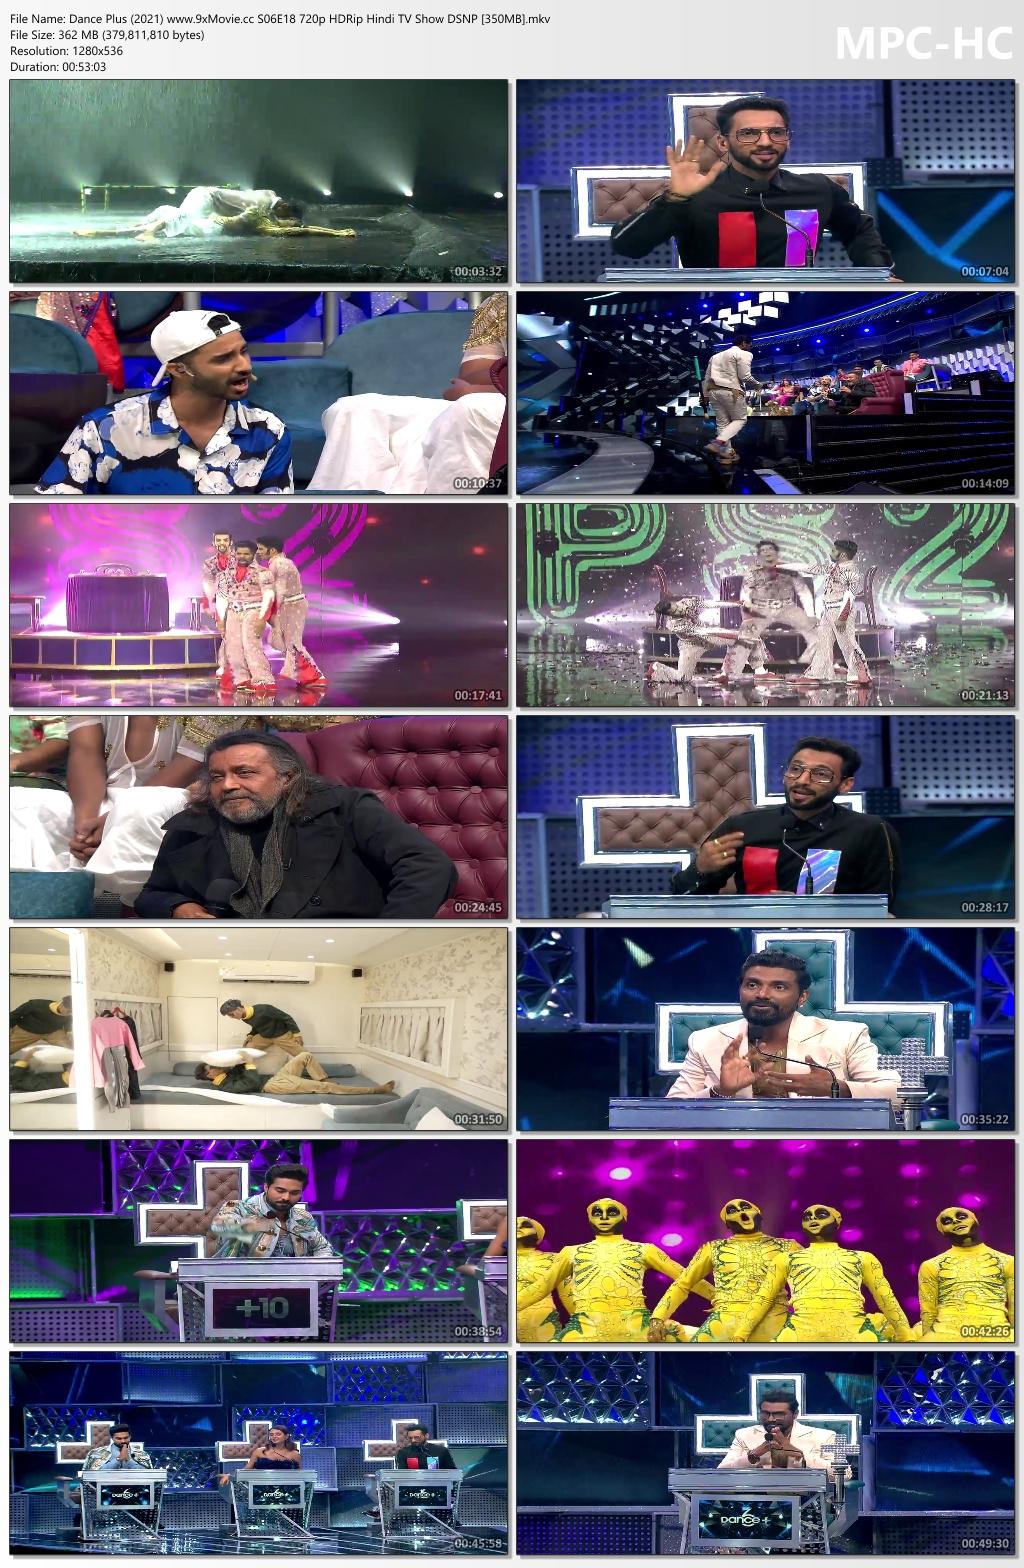 Dance-Plus-2021-www-9x-Movie-cc-S06-E18-720p-HDRip-Hindi-TV-Show-DSNP-350-MB-mkv